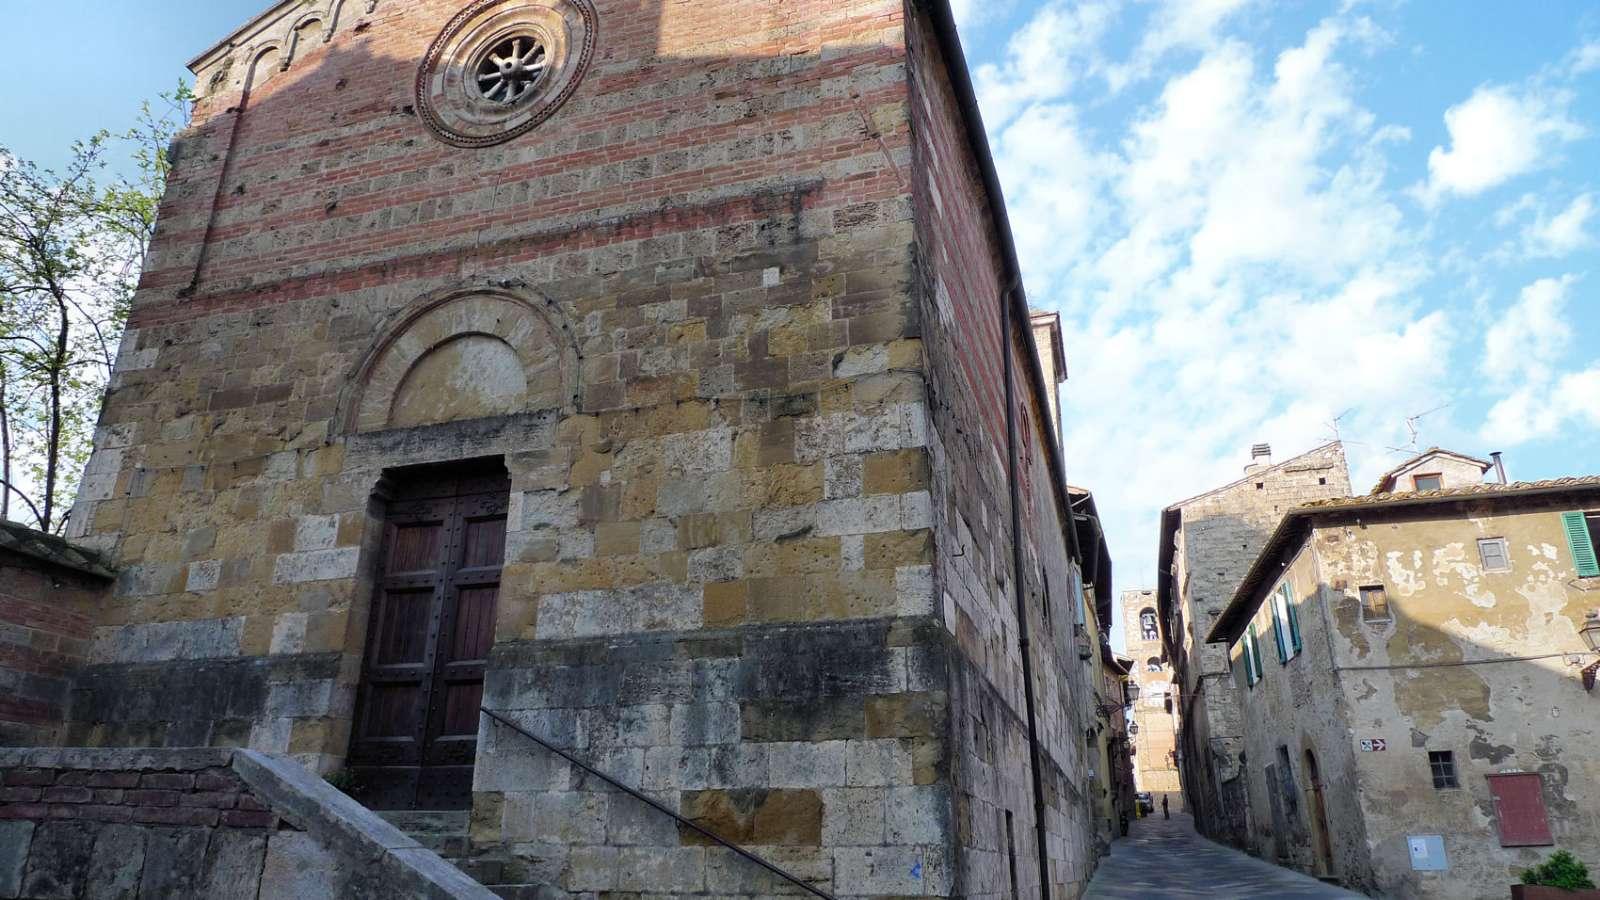 Medieval church of Santa Maria in Canonica